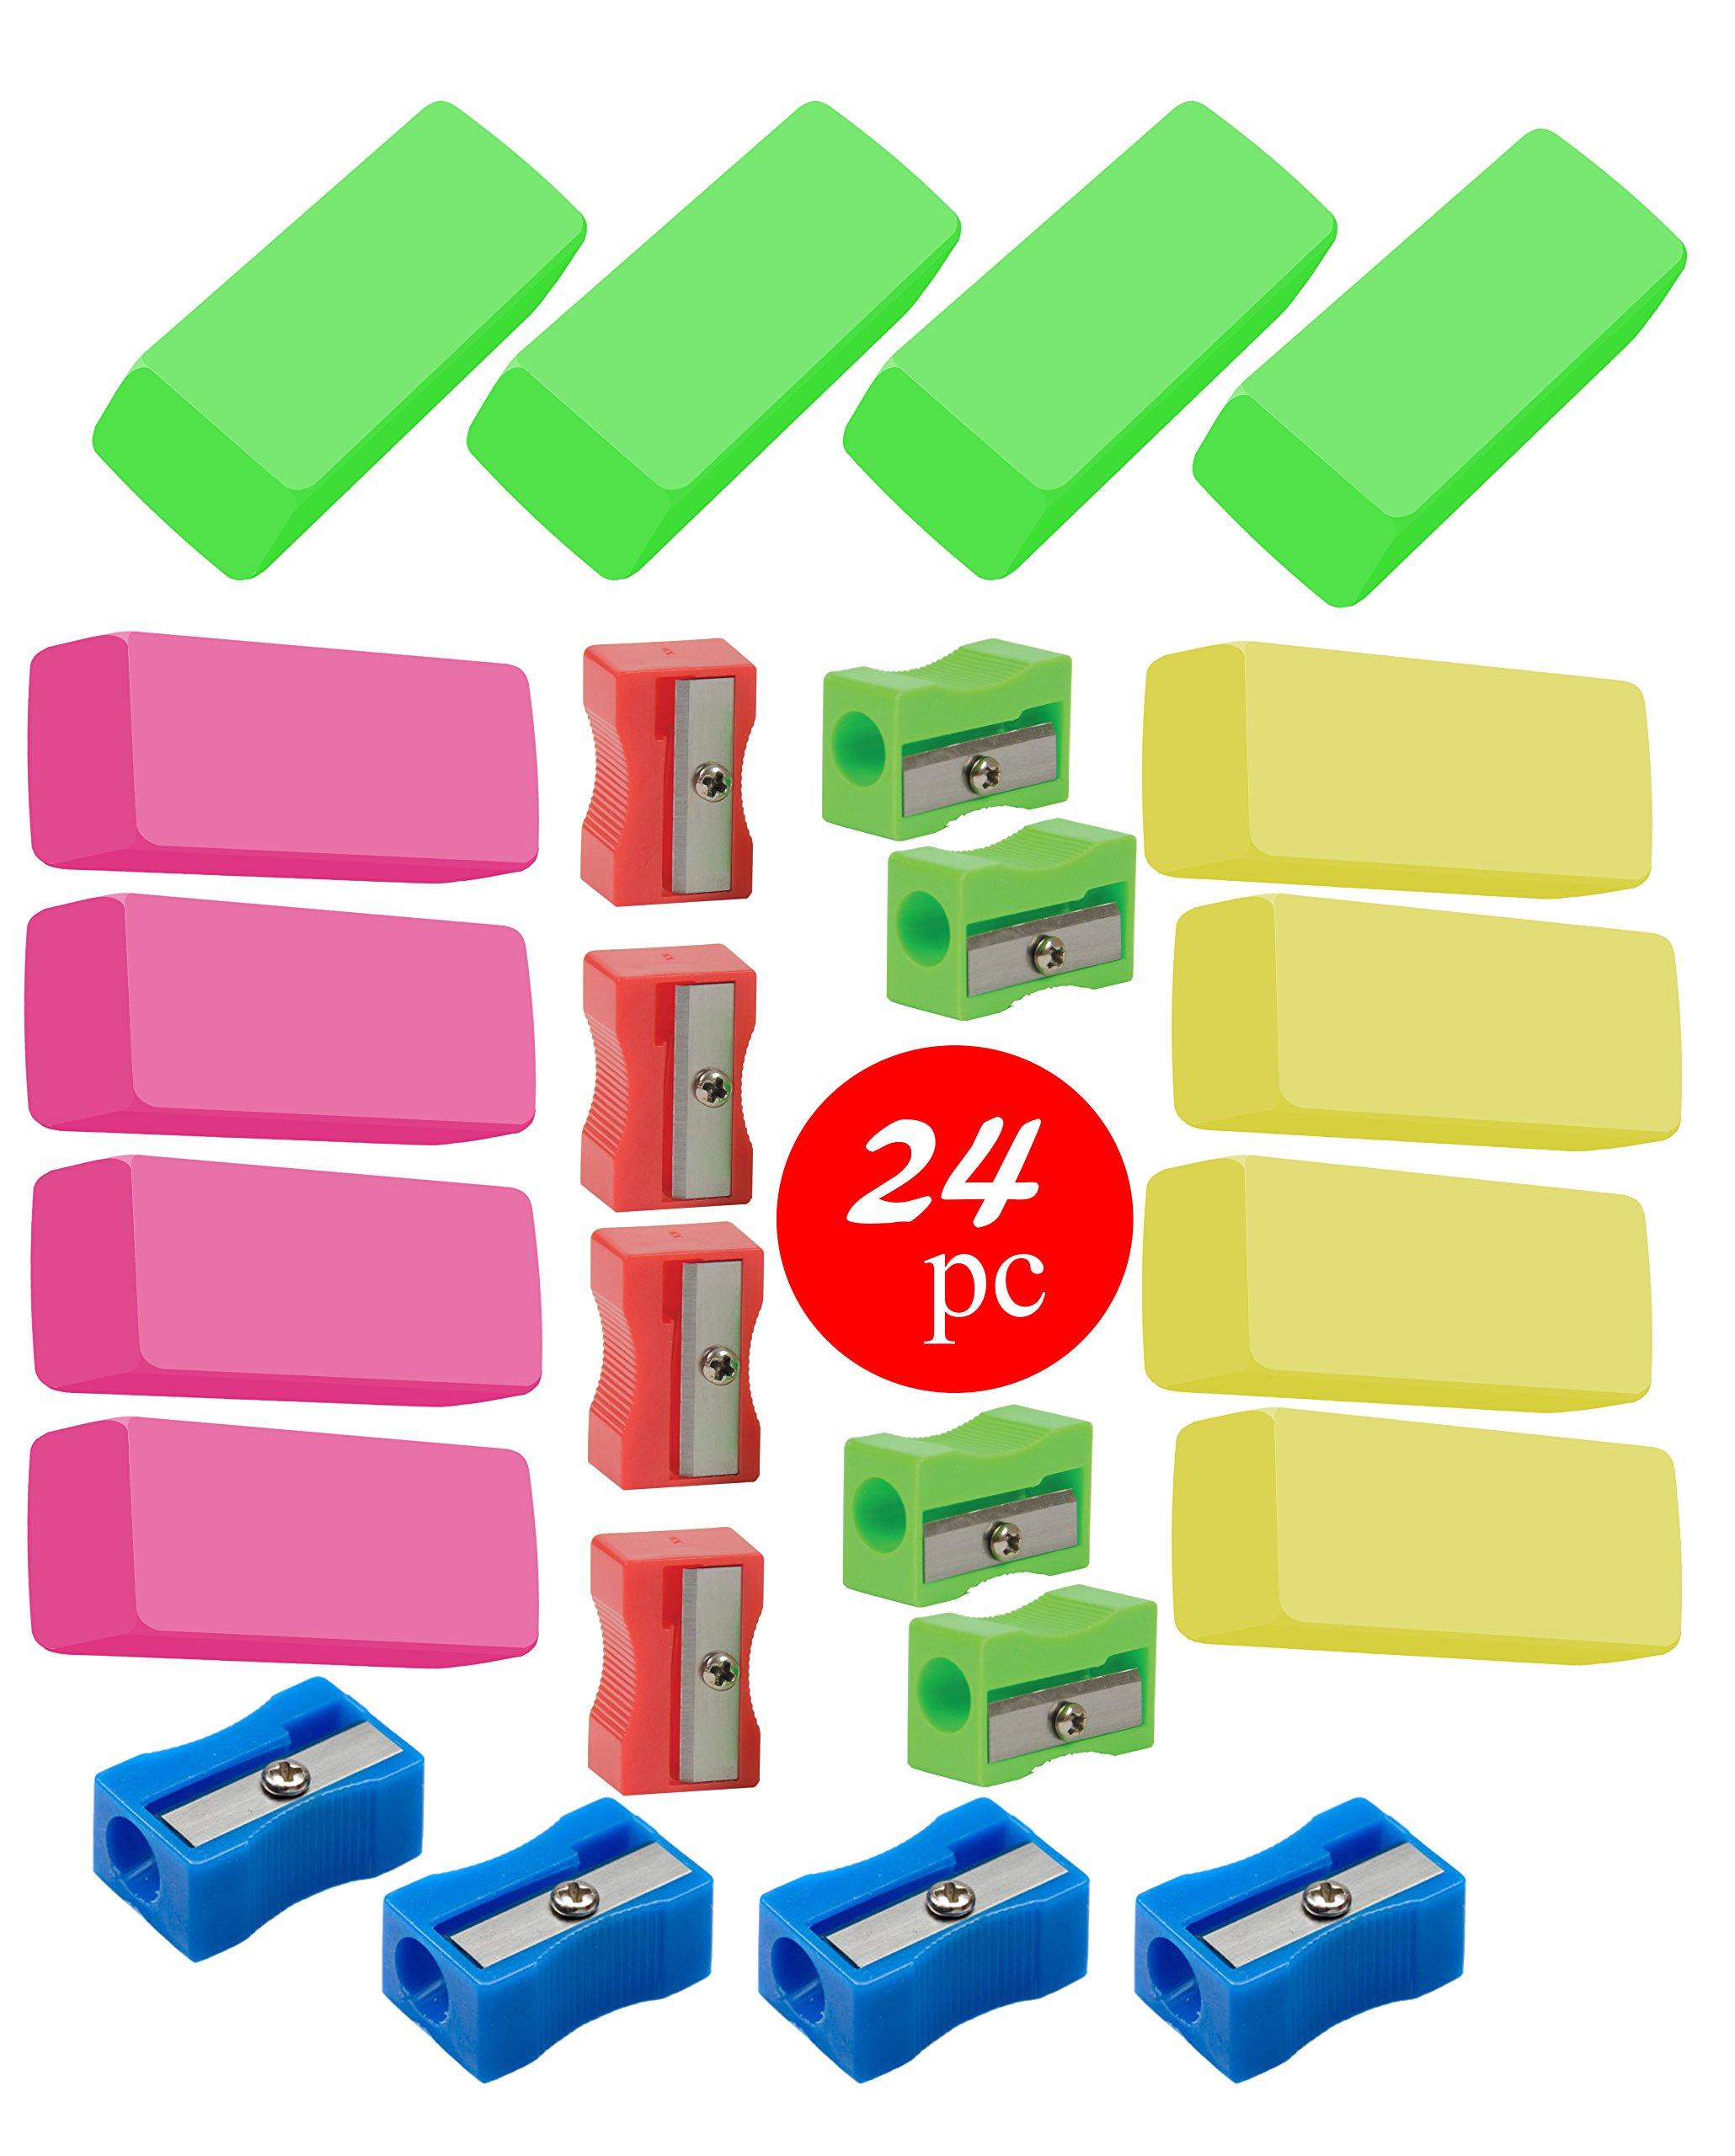 Classroom Pencil Sharpener and Eraser (24pc)